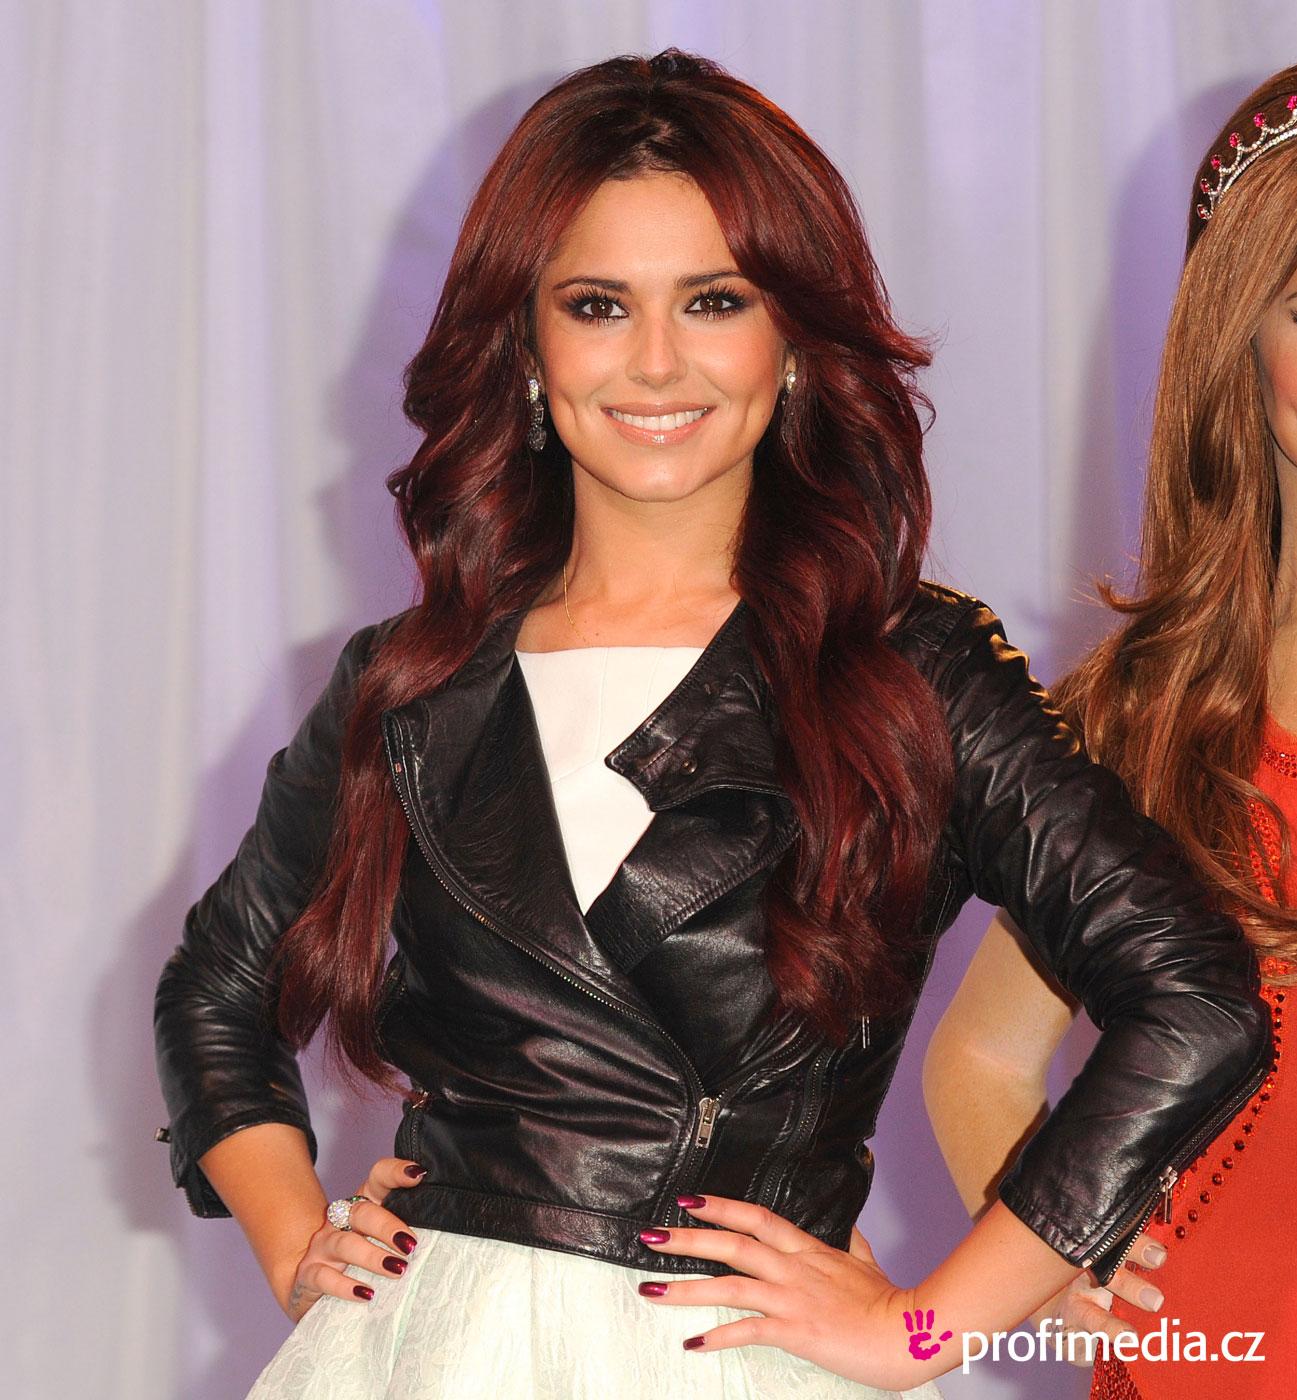 Cheryl Cole Wedding Hairstyle: EasyHairStyler